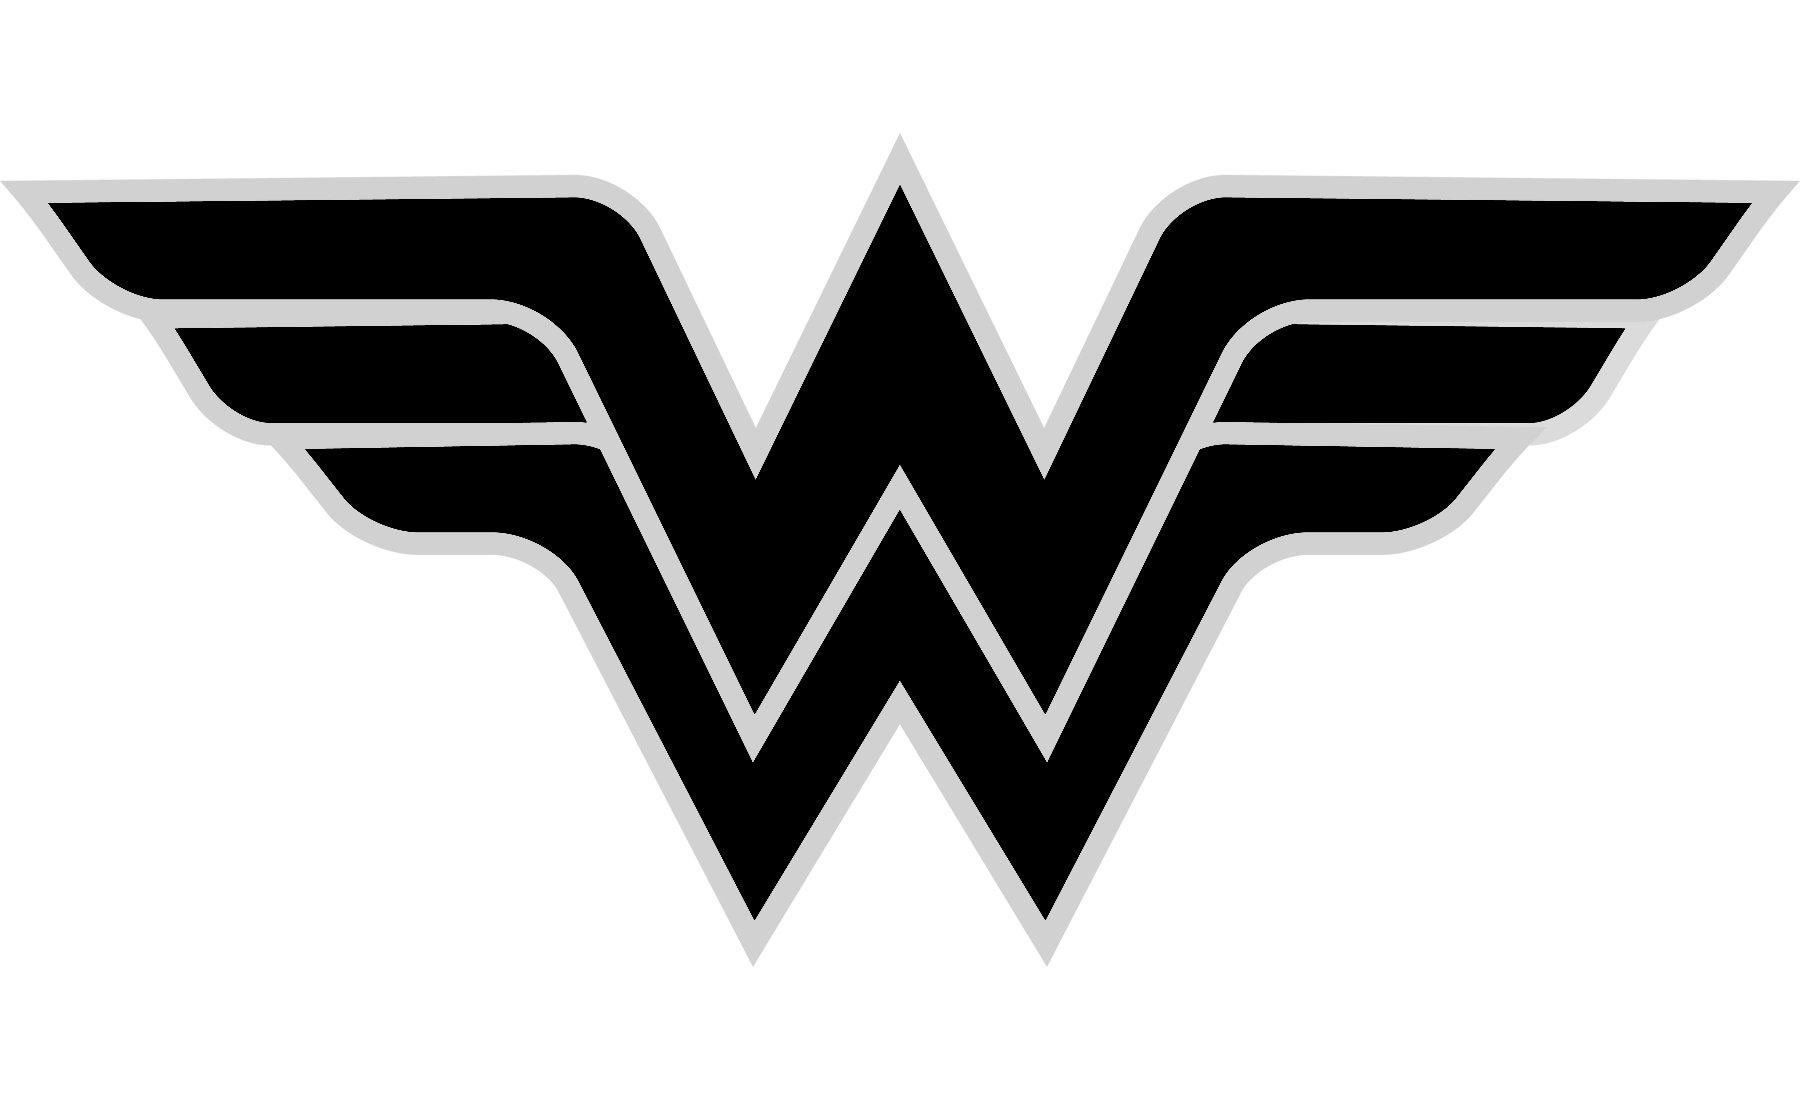 wonder woman logo wonder woman symbol meaning history